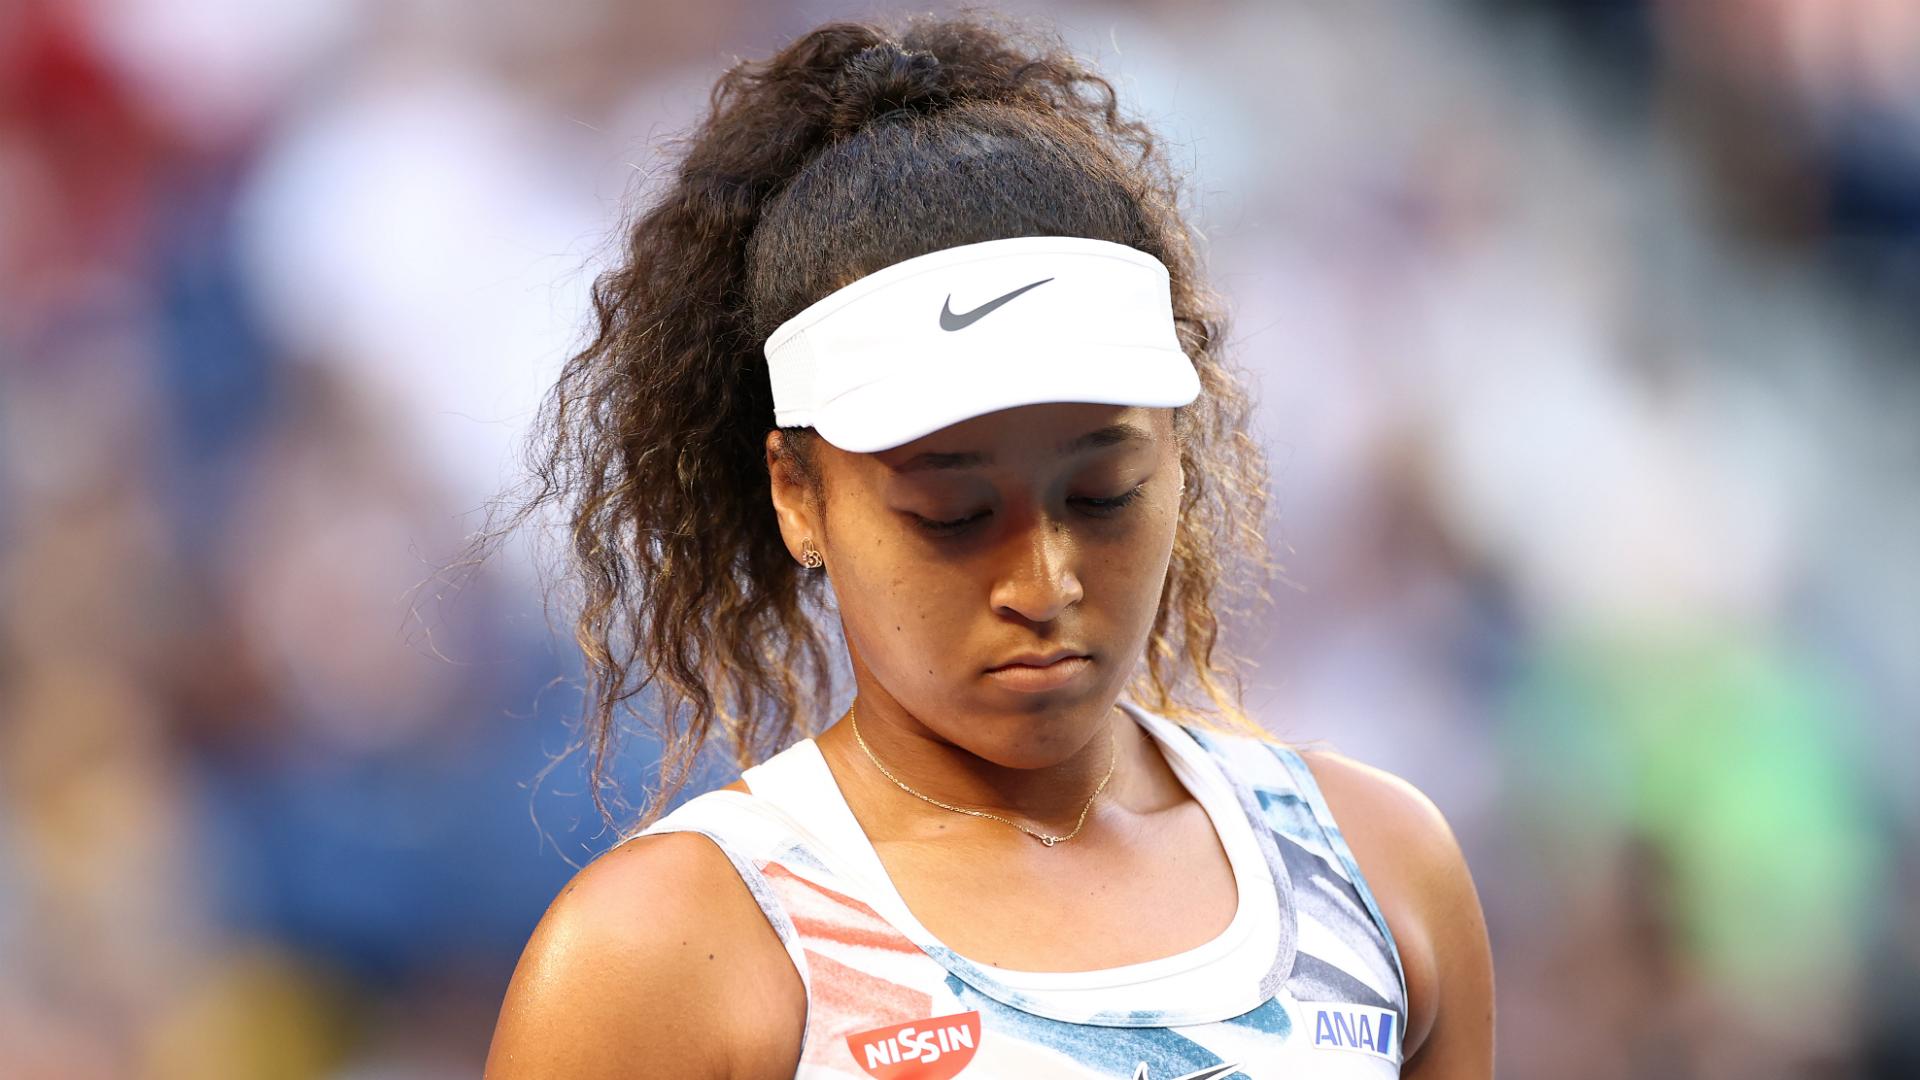 Australian Open 2020: Barty breezes through as Osaka, Williams are stunned